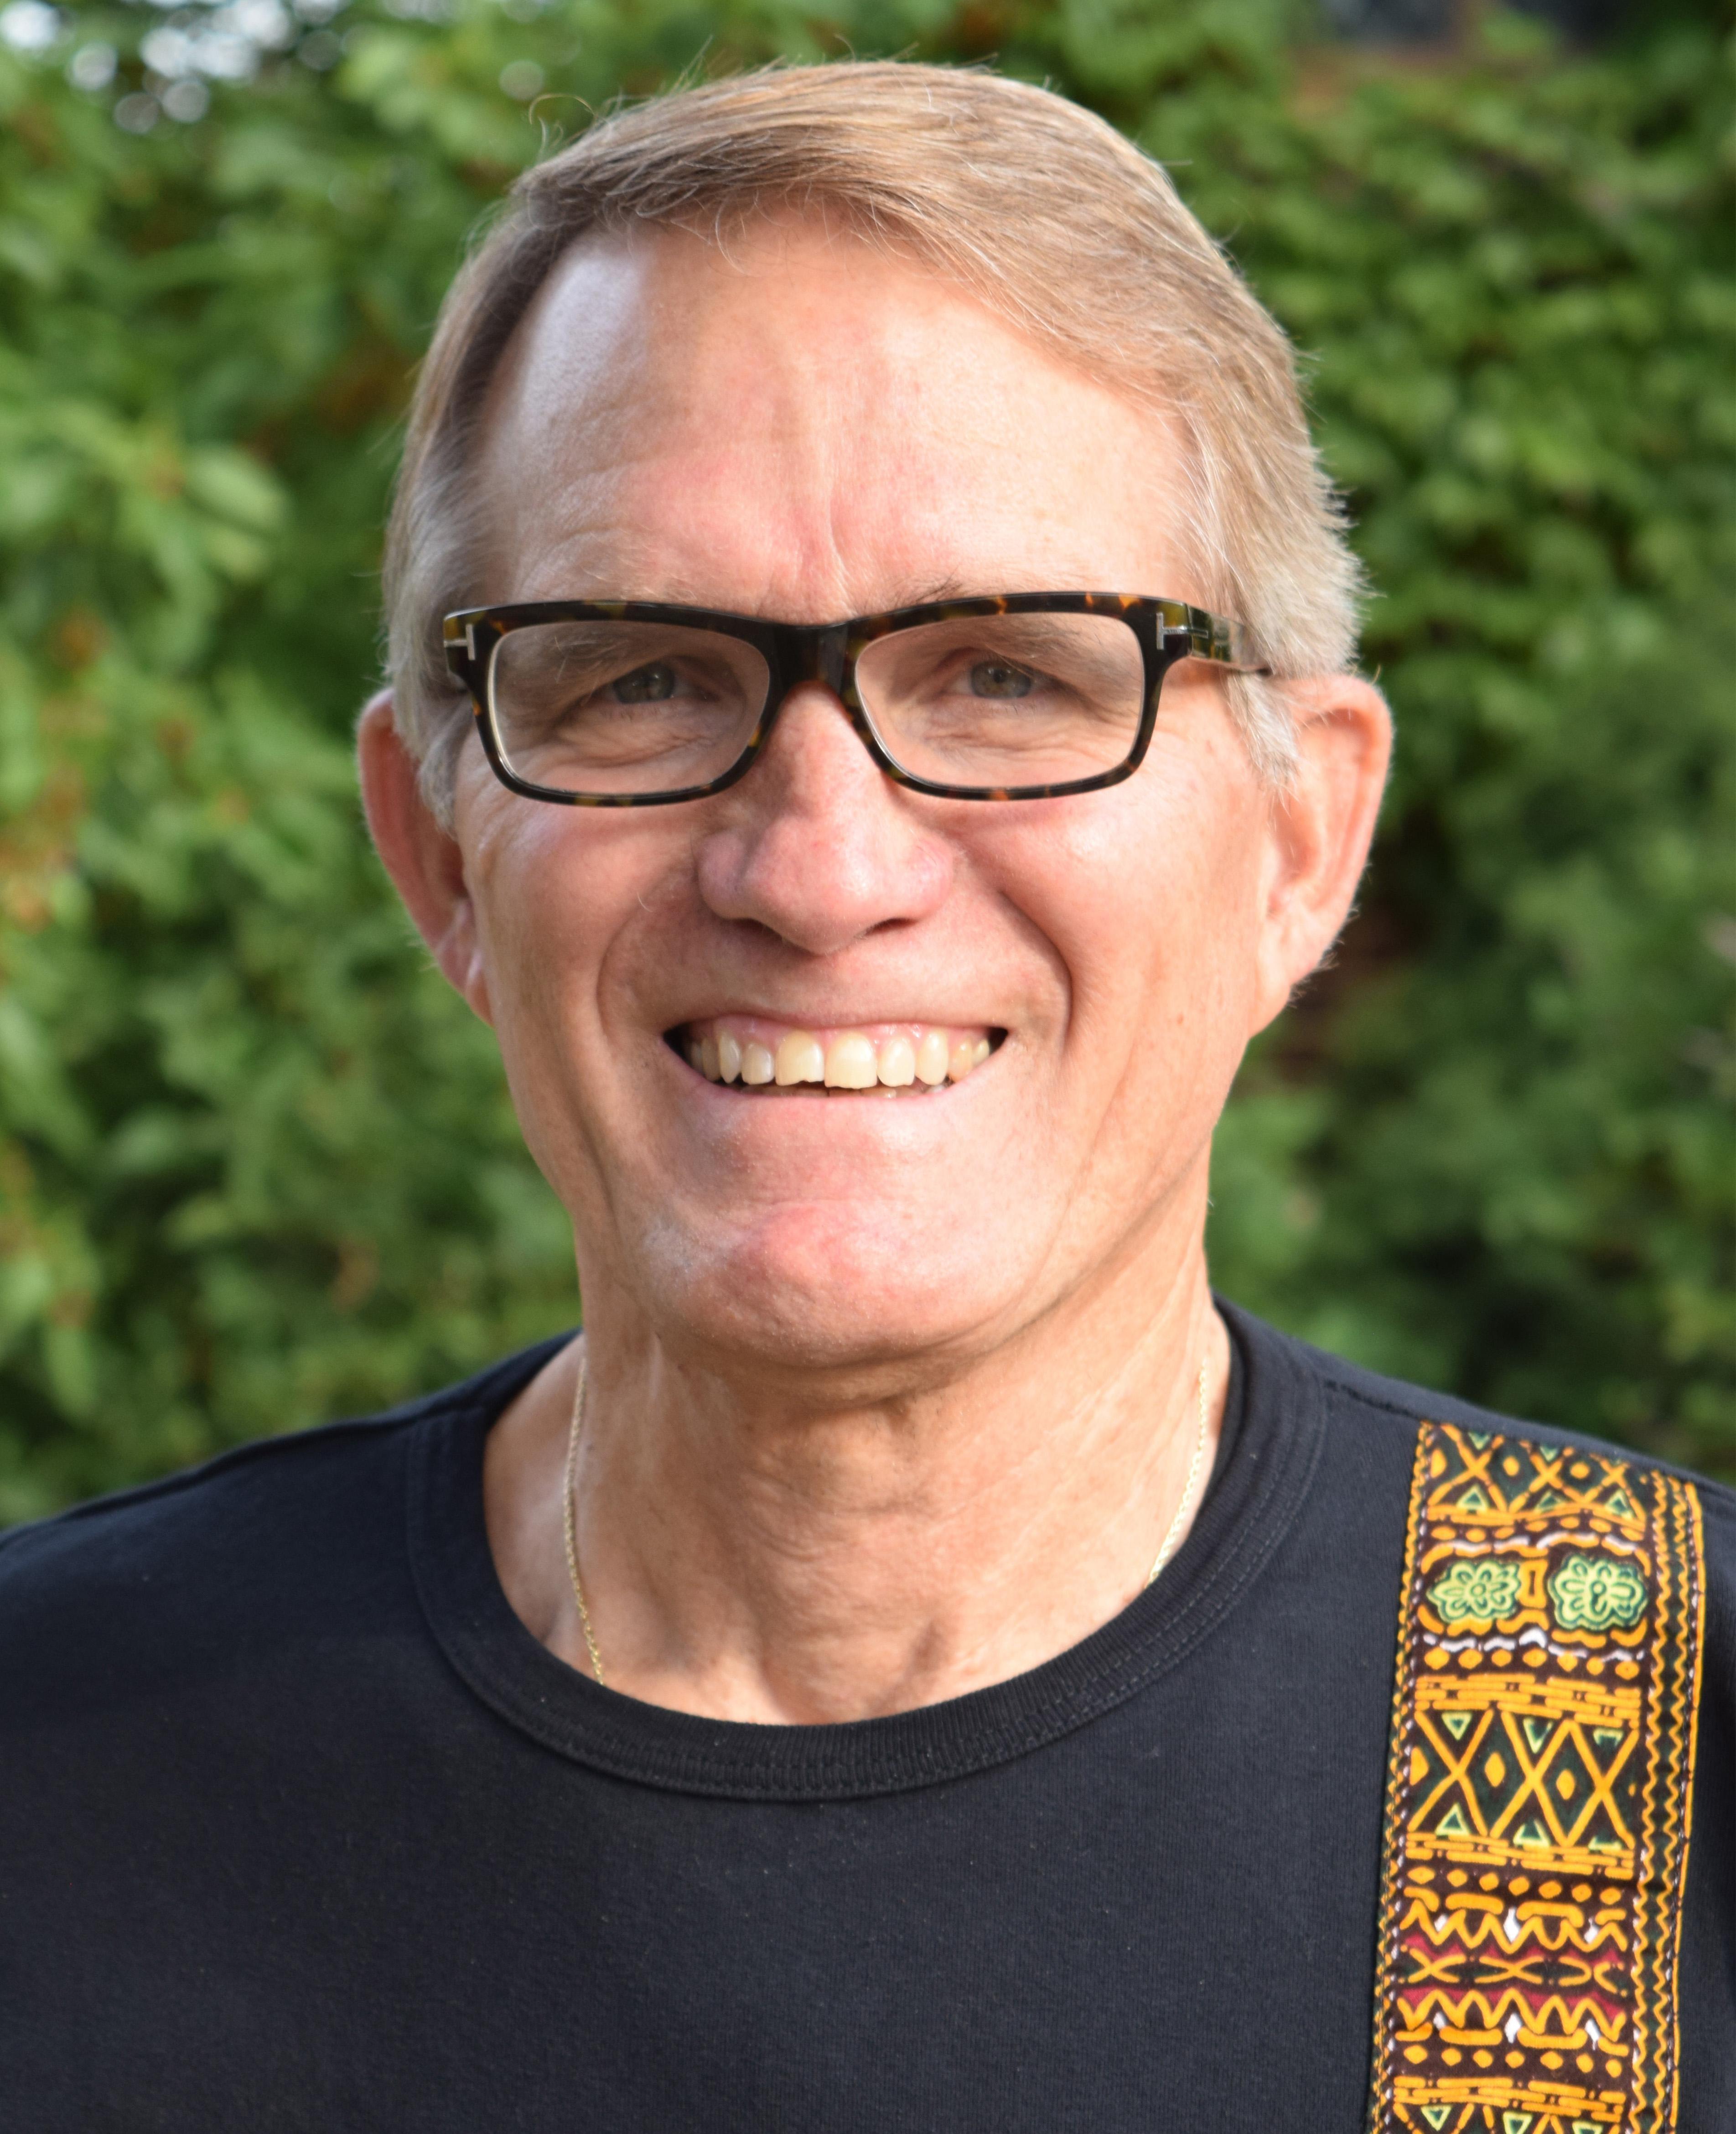 Dave Groenewold